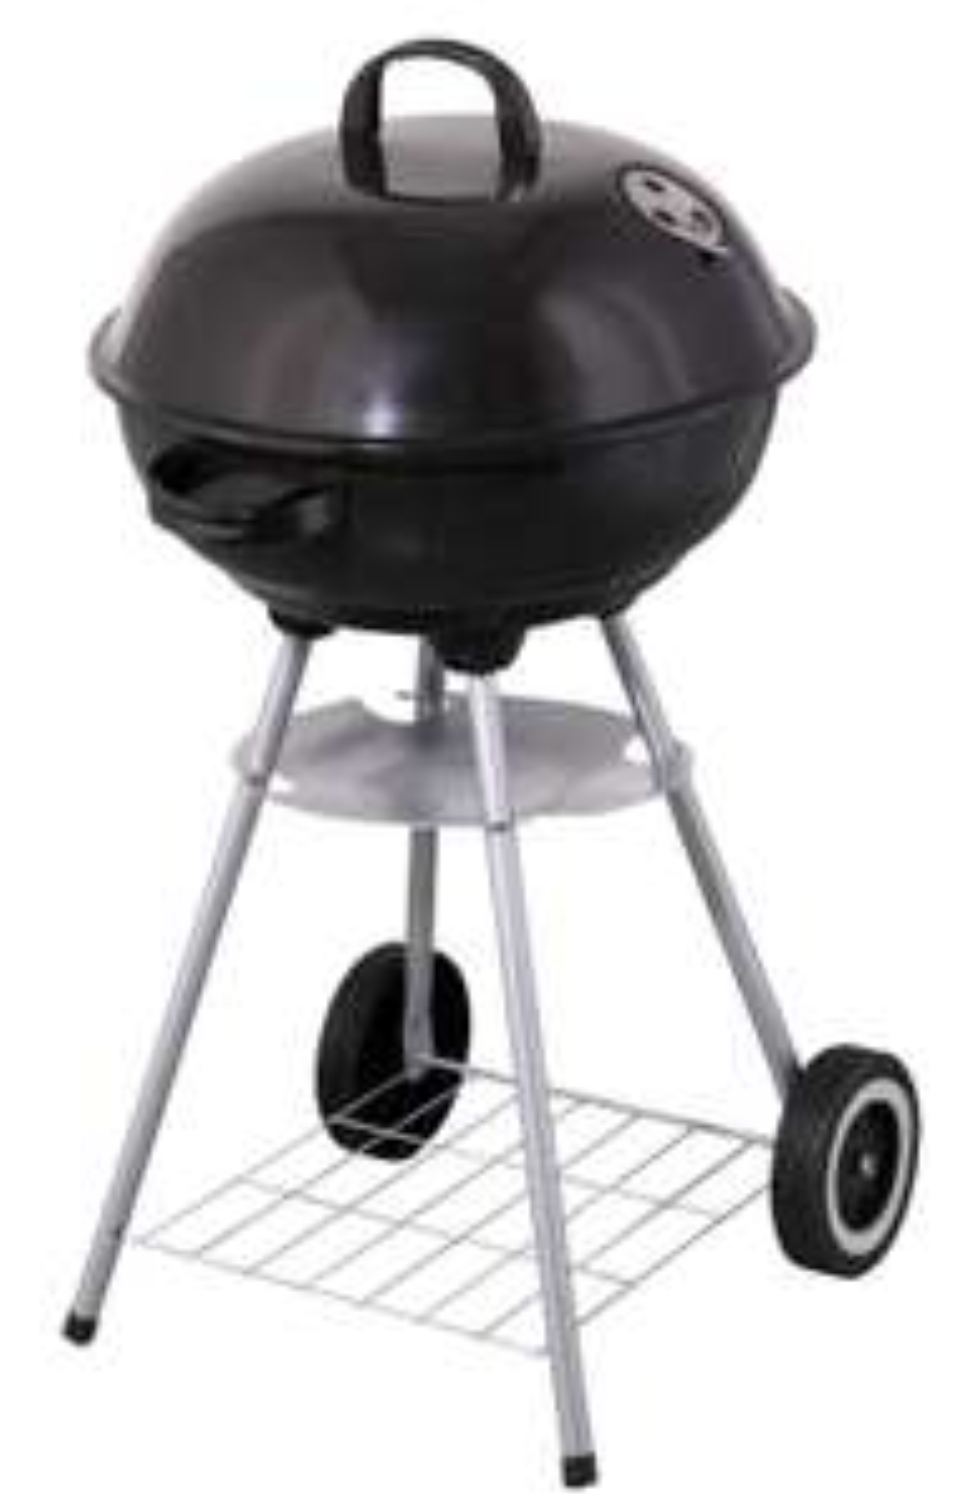 Texas 43cm Kettle Charcoal BBQ for £21 @ Homebase (Free C&C / Texas Round Portable BBQ £12.60)